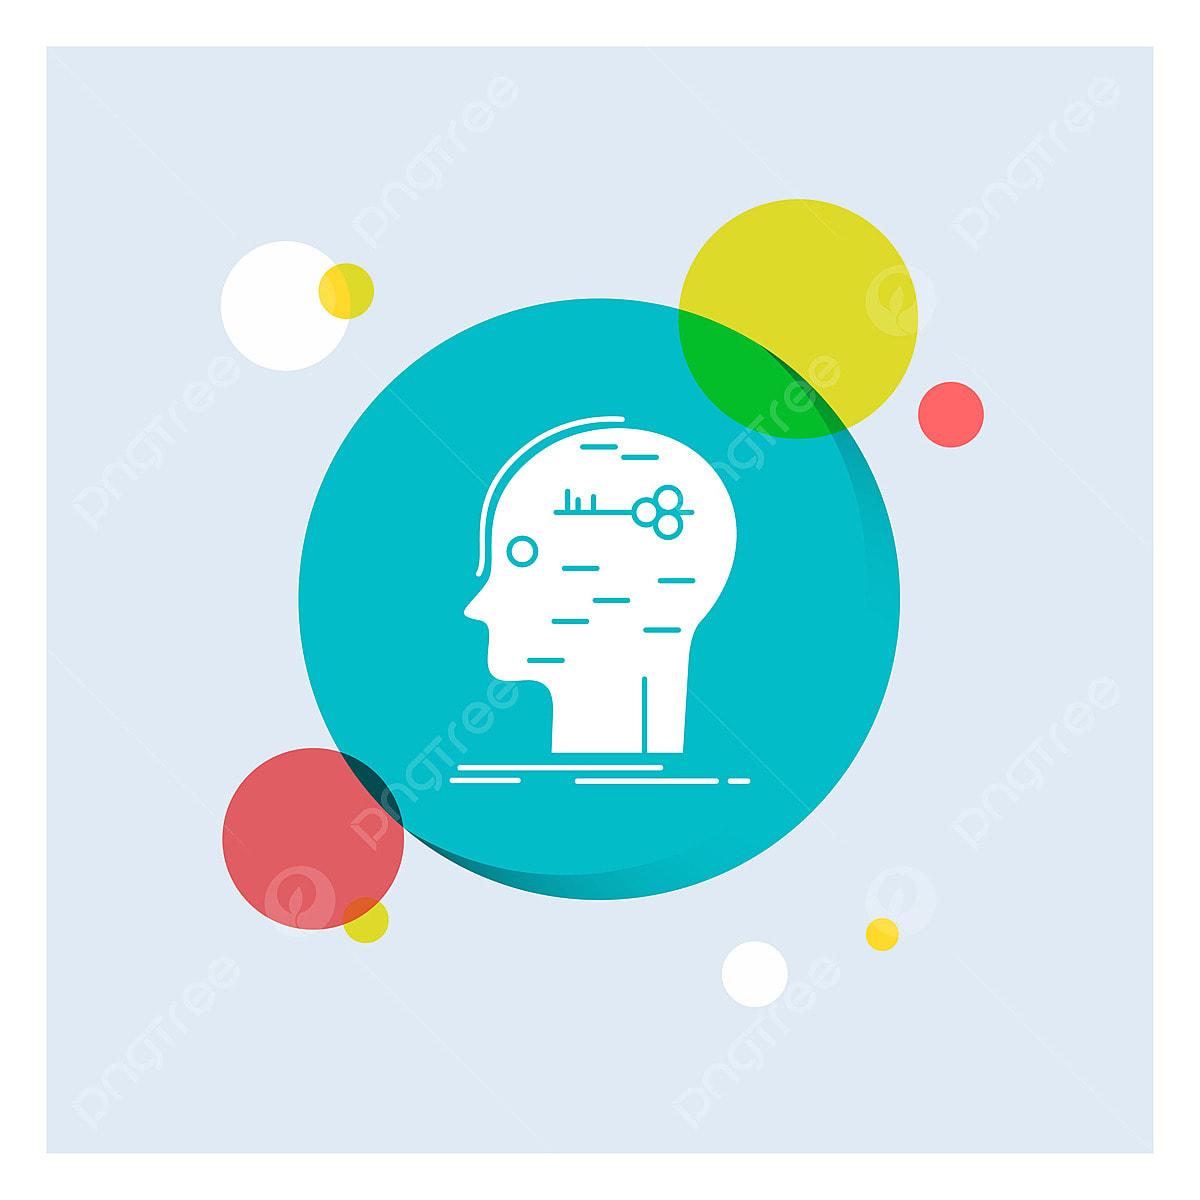 Brain Hack Hacking Key Mind White Glyph Icon Colorful Circle